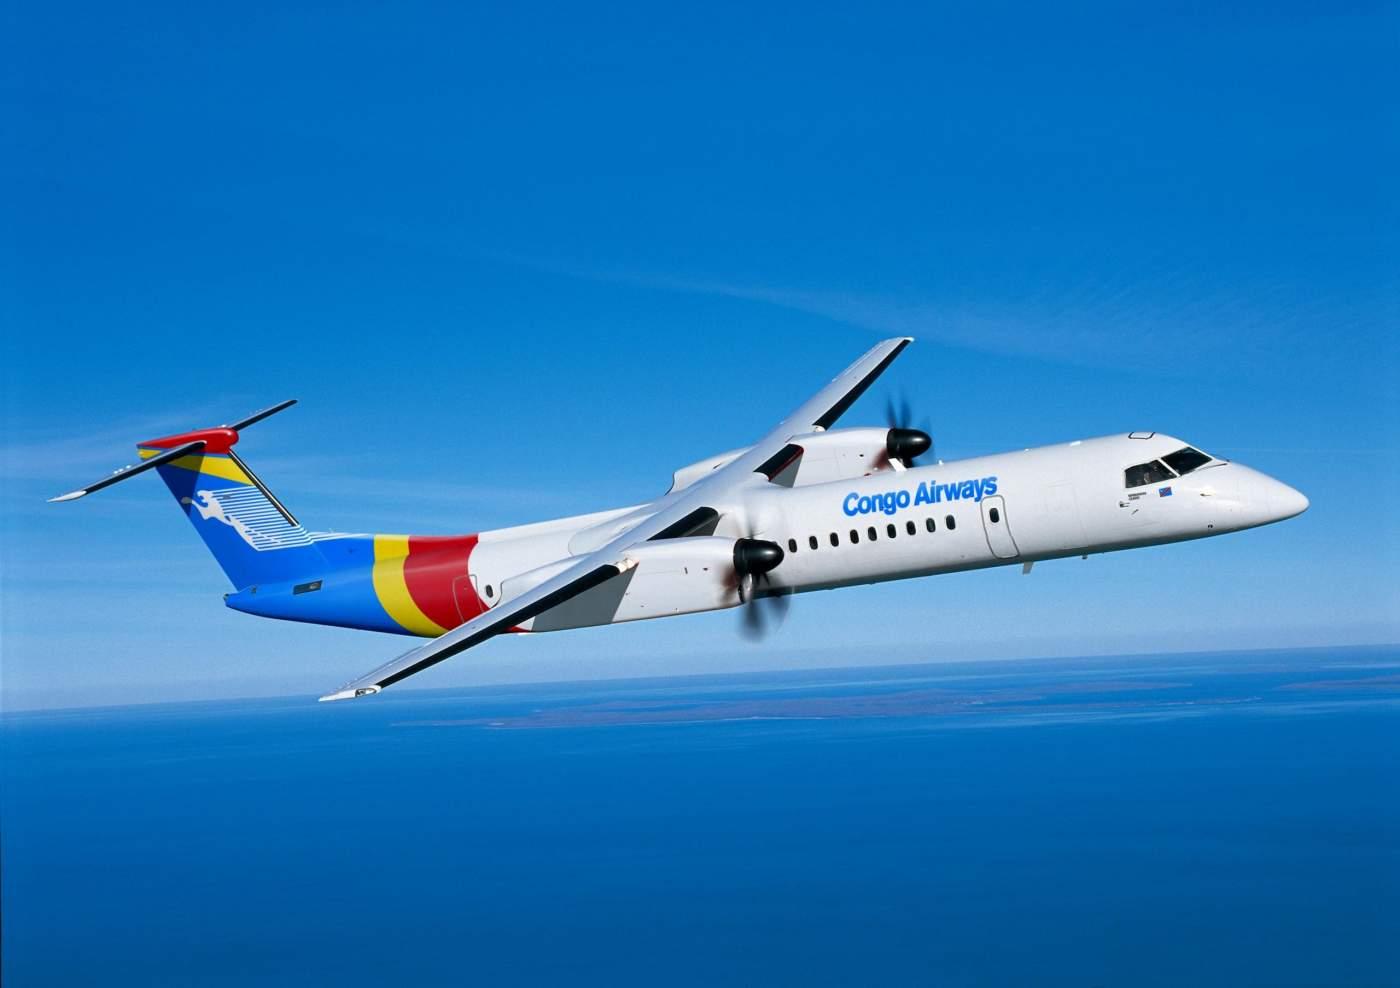 Dash 8 Congo Airways